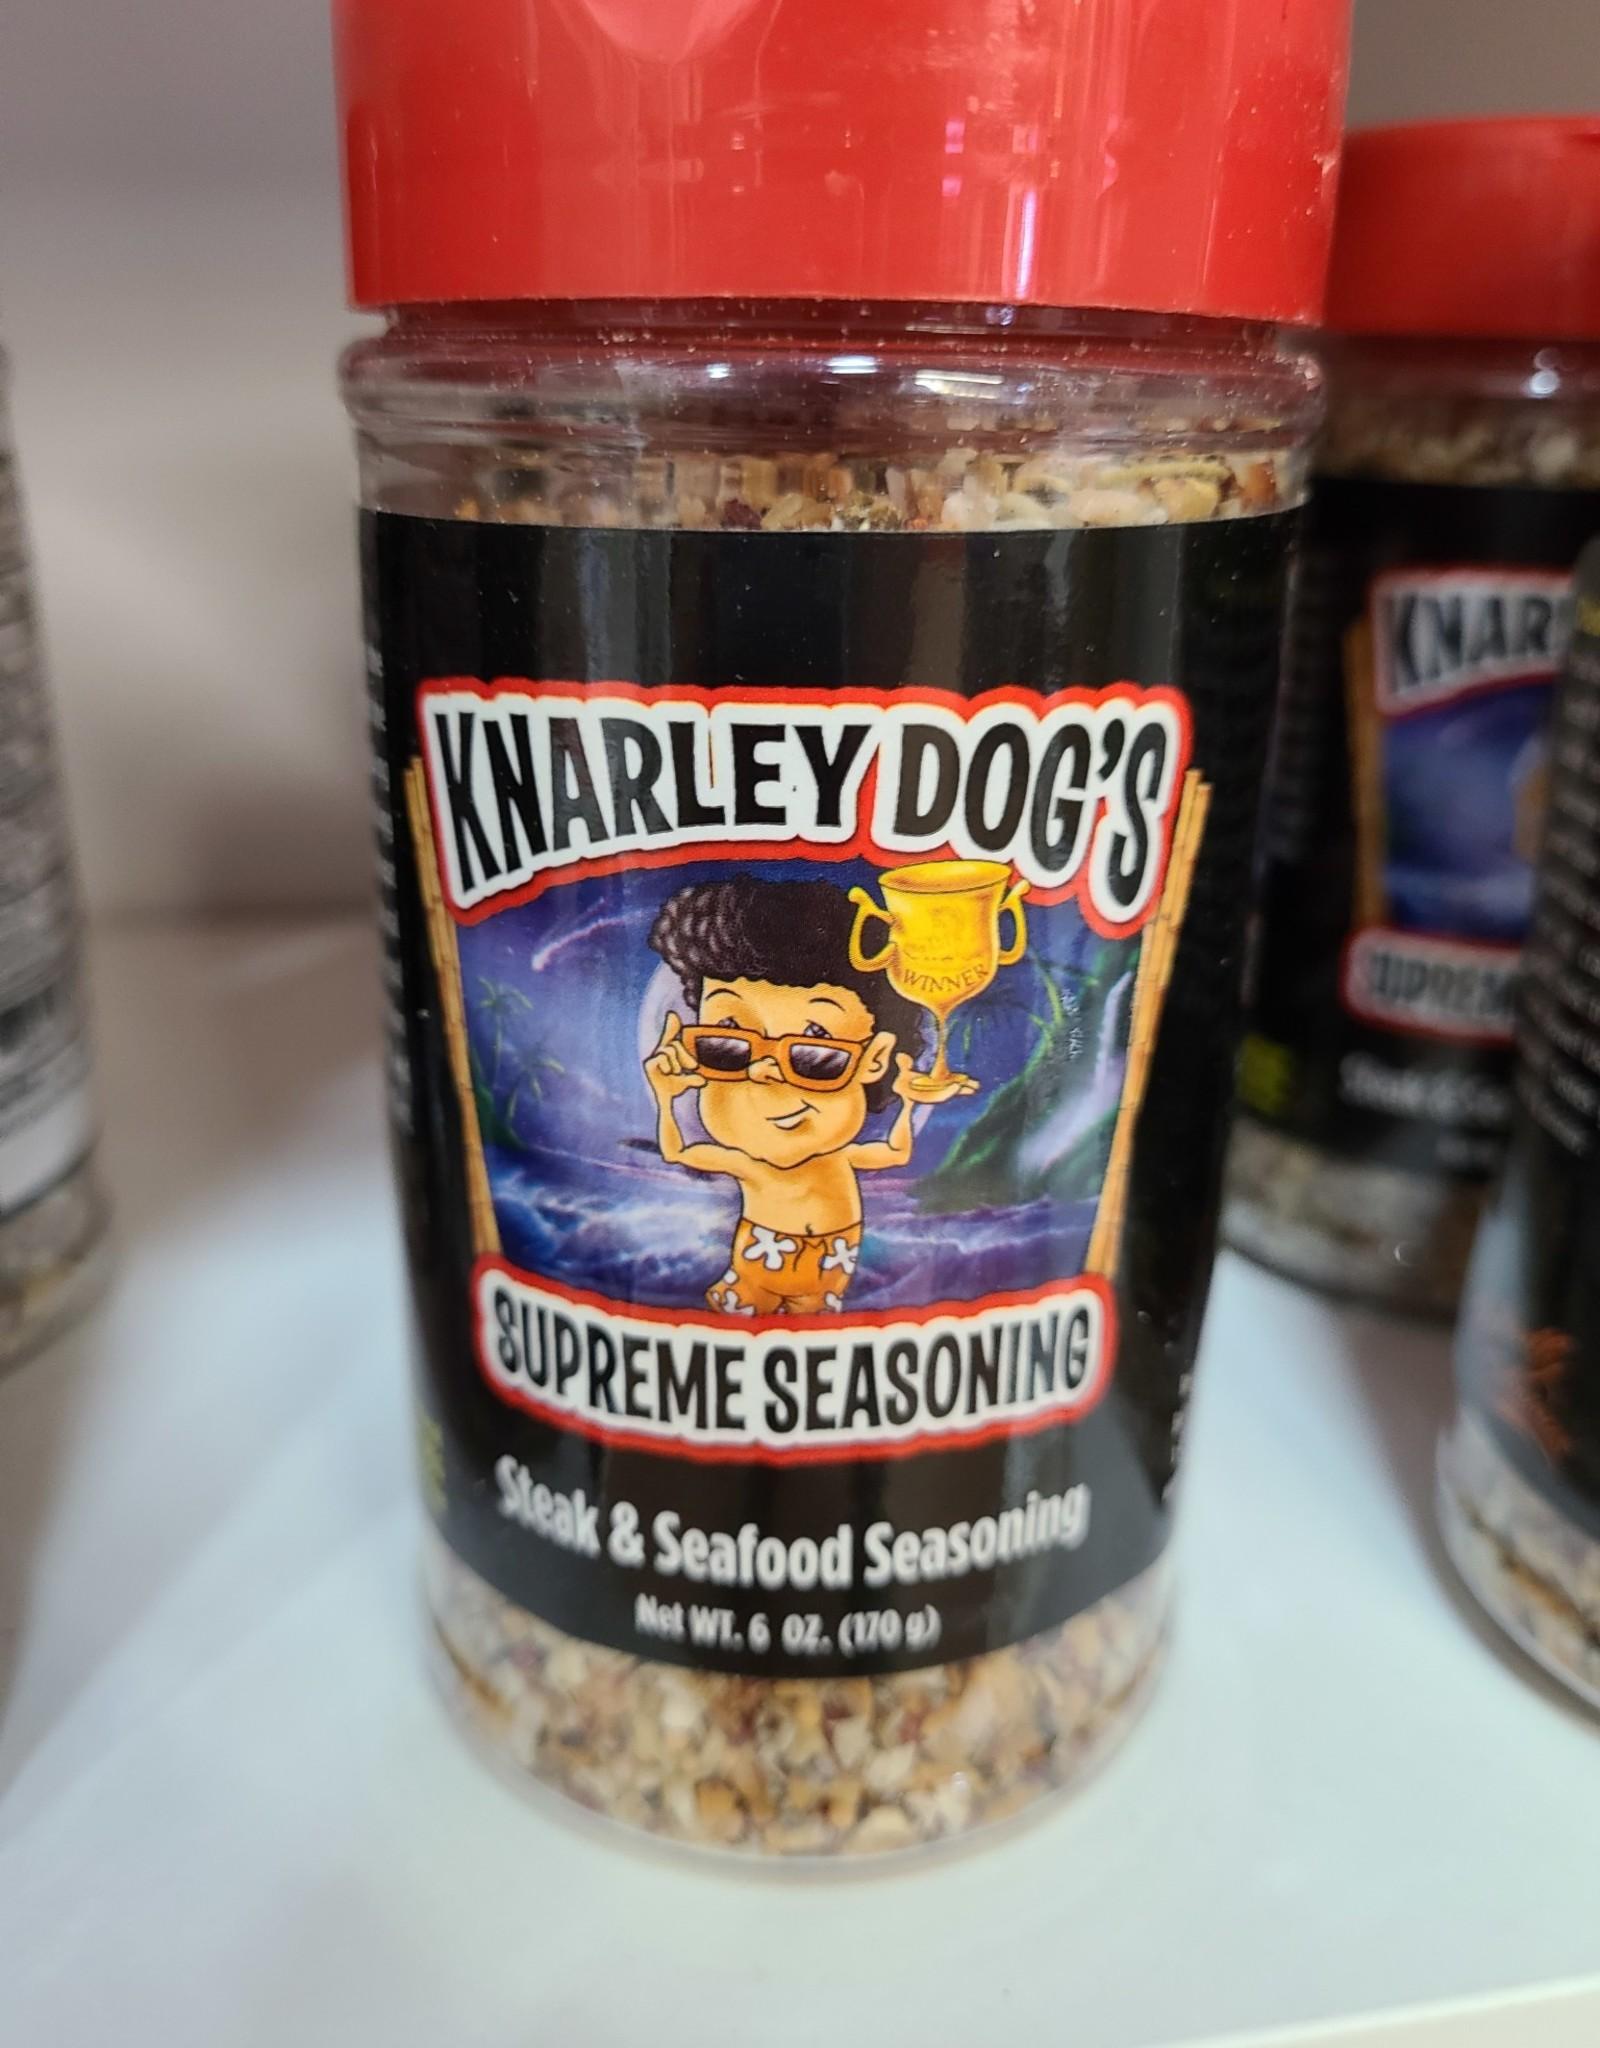 Knarley Dog's Supreme Seasoning Steak & Seafood Seasoning